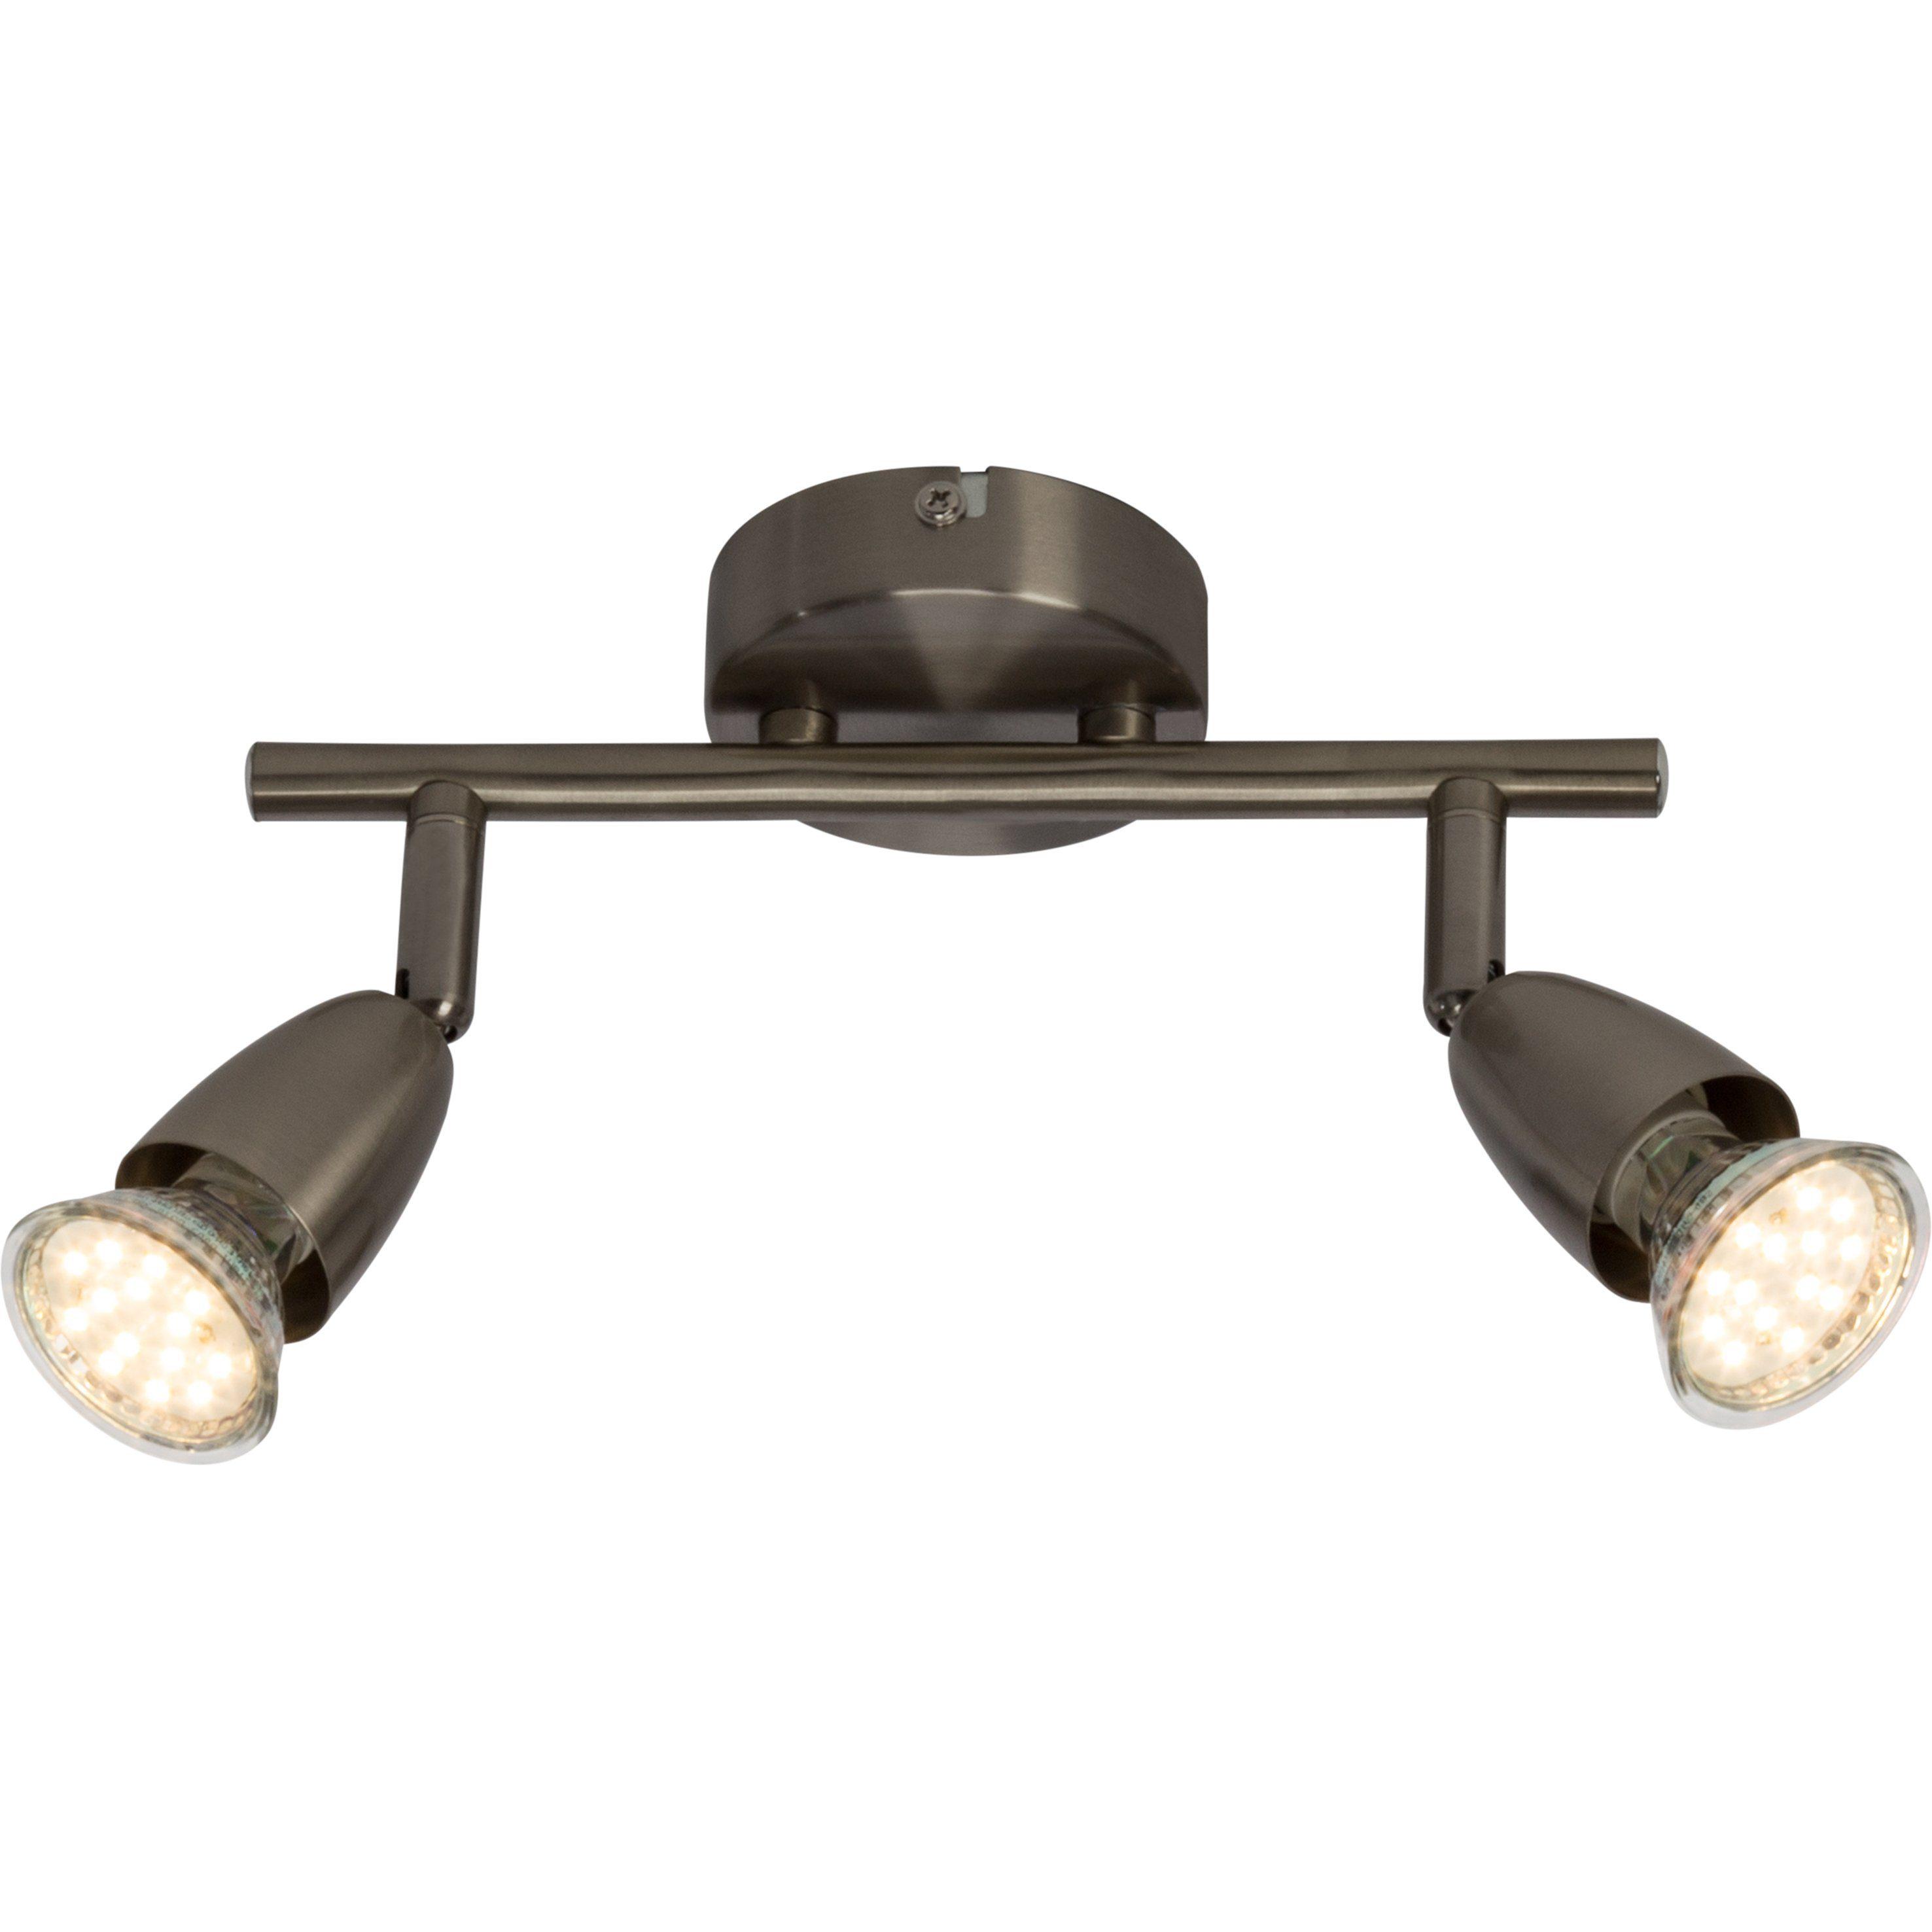 Brilliant Leuchten Amalfi LED Spotrohr, 2-flammig eisen